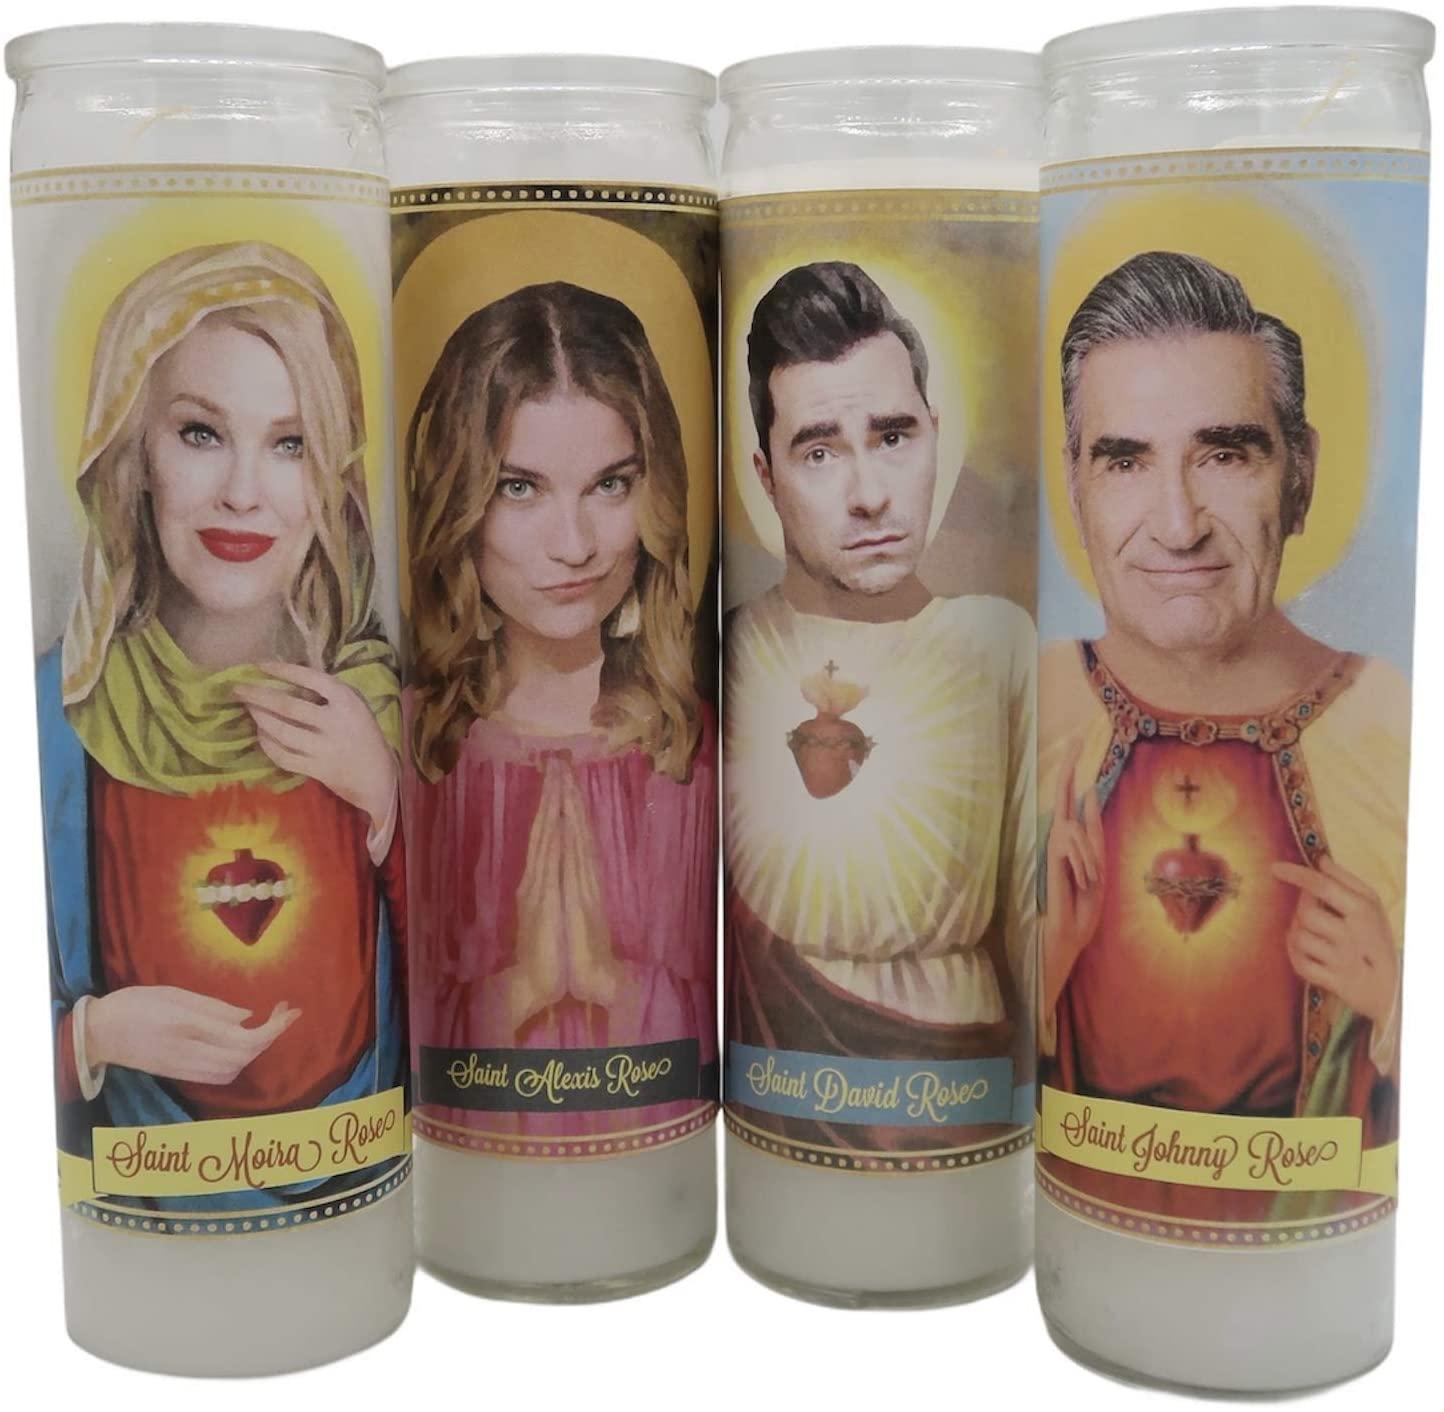 schitts-creek-prayer-candles